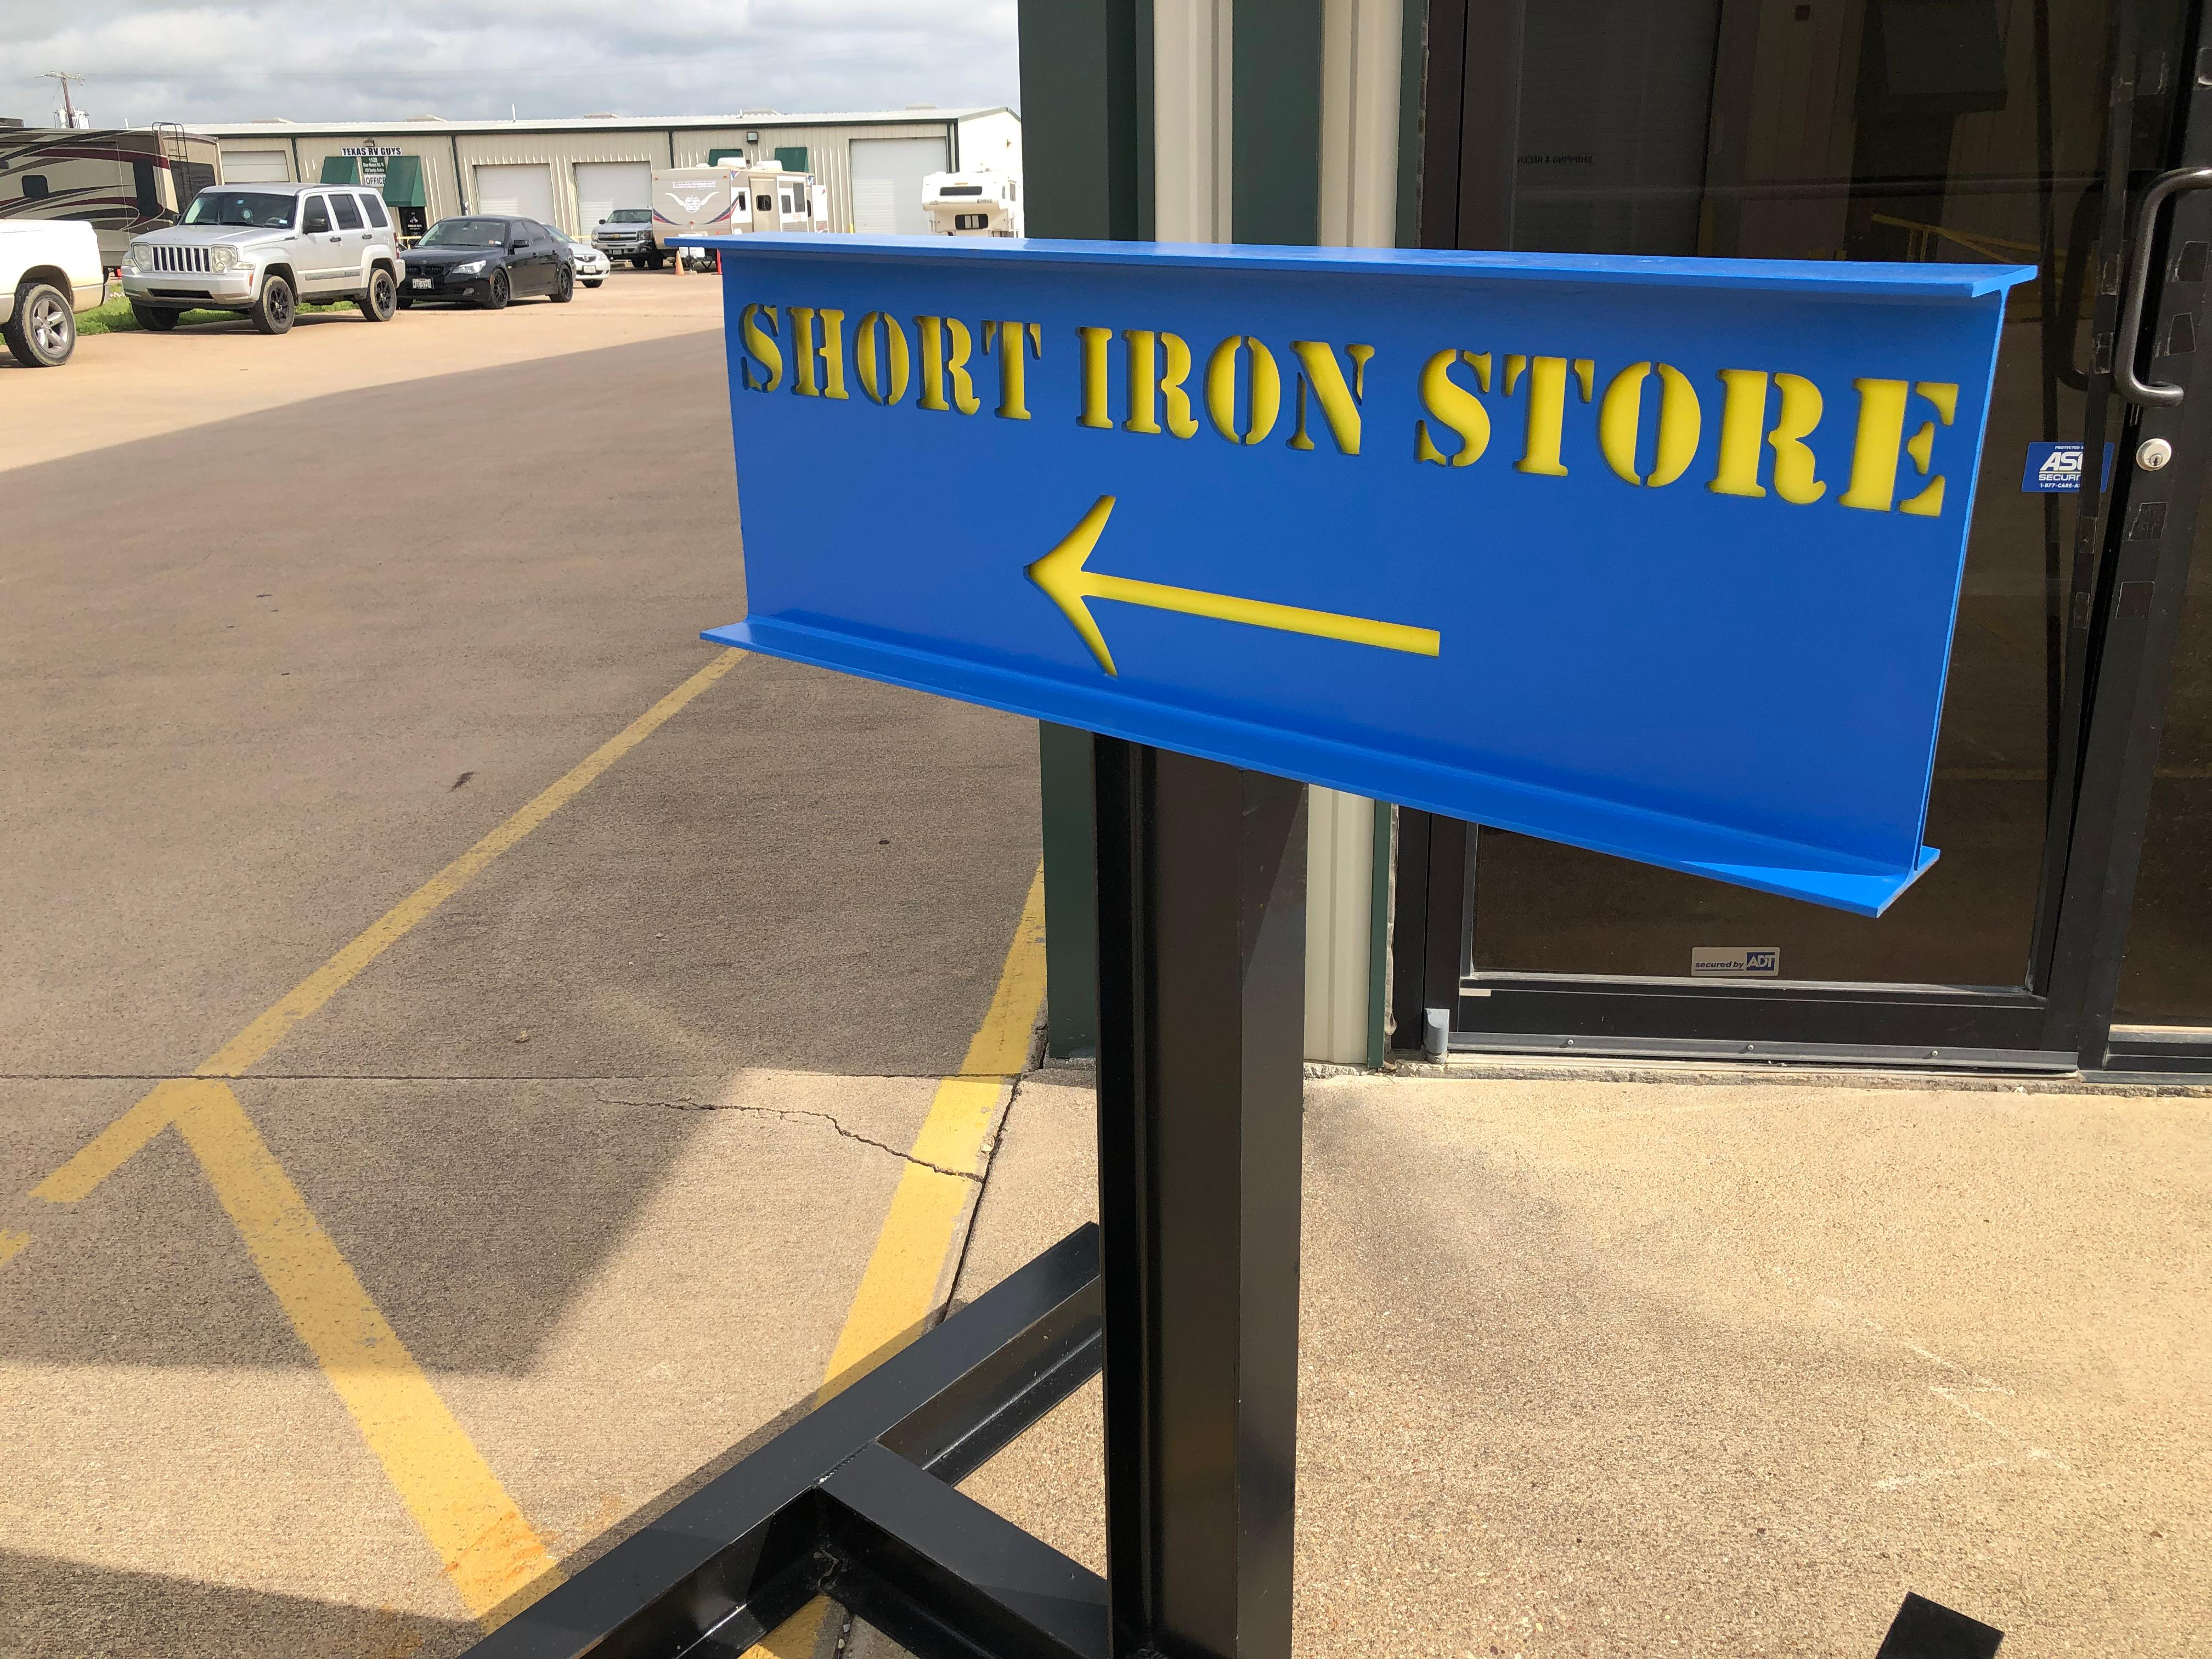 Short Iron Store Steel & Supply image 6